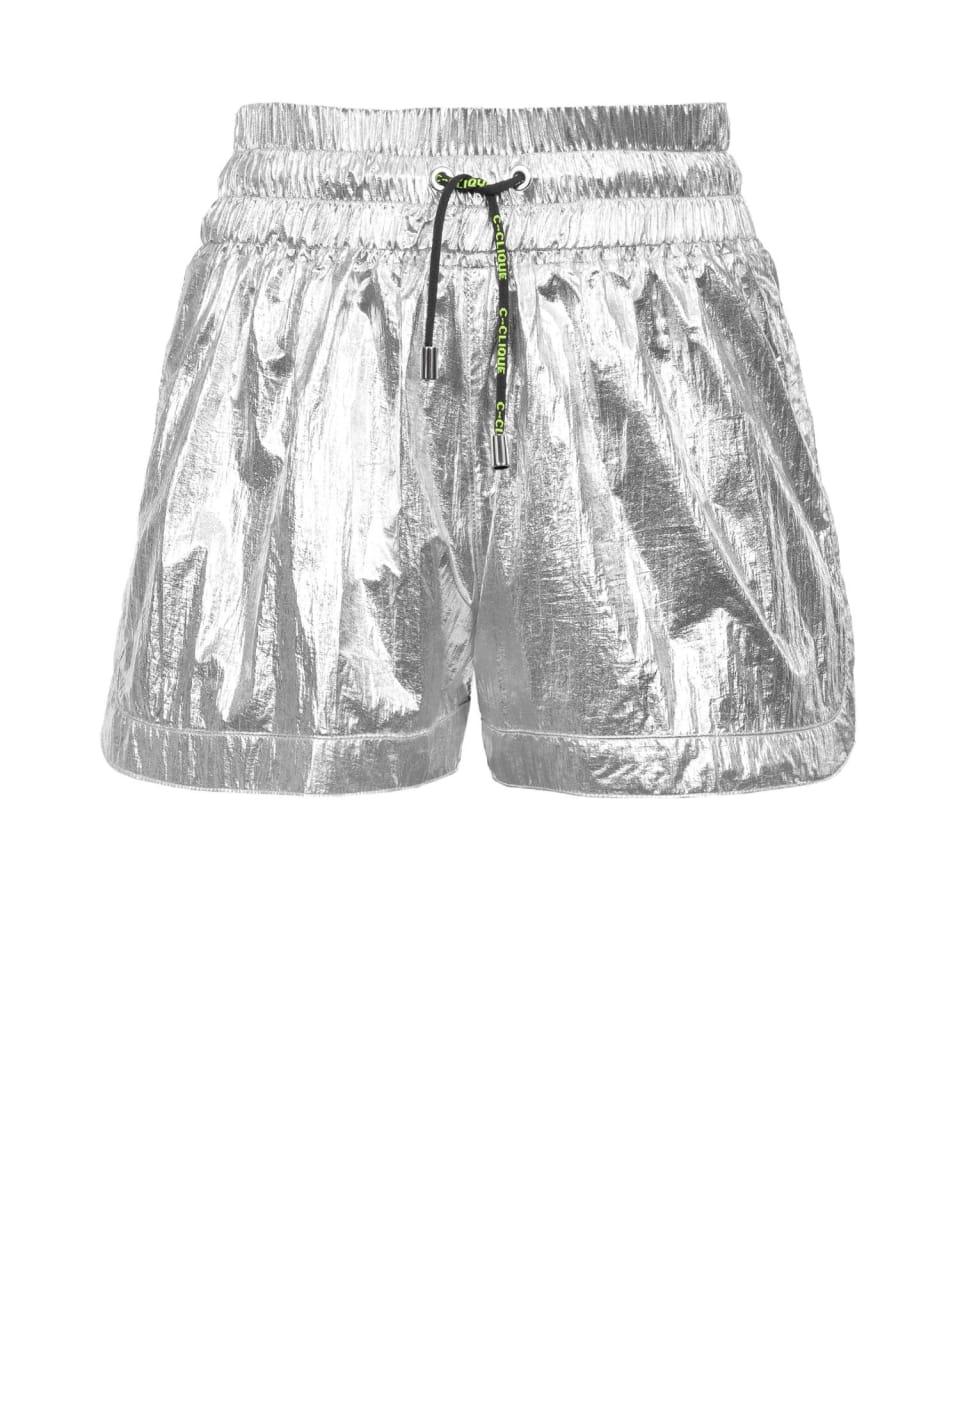 Laminated shorts